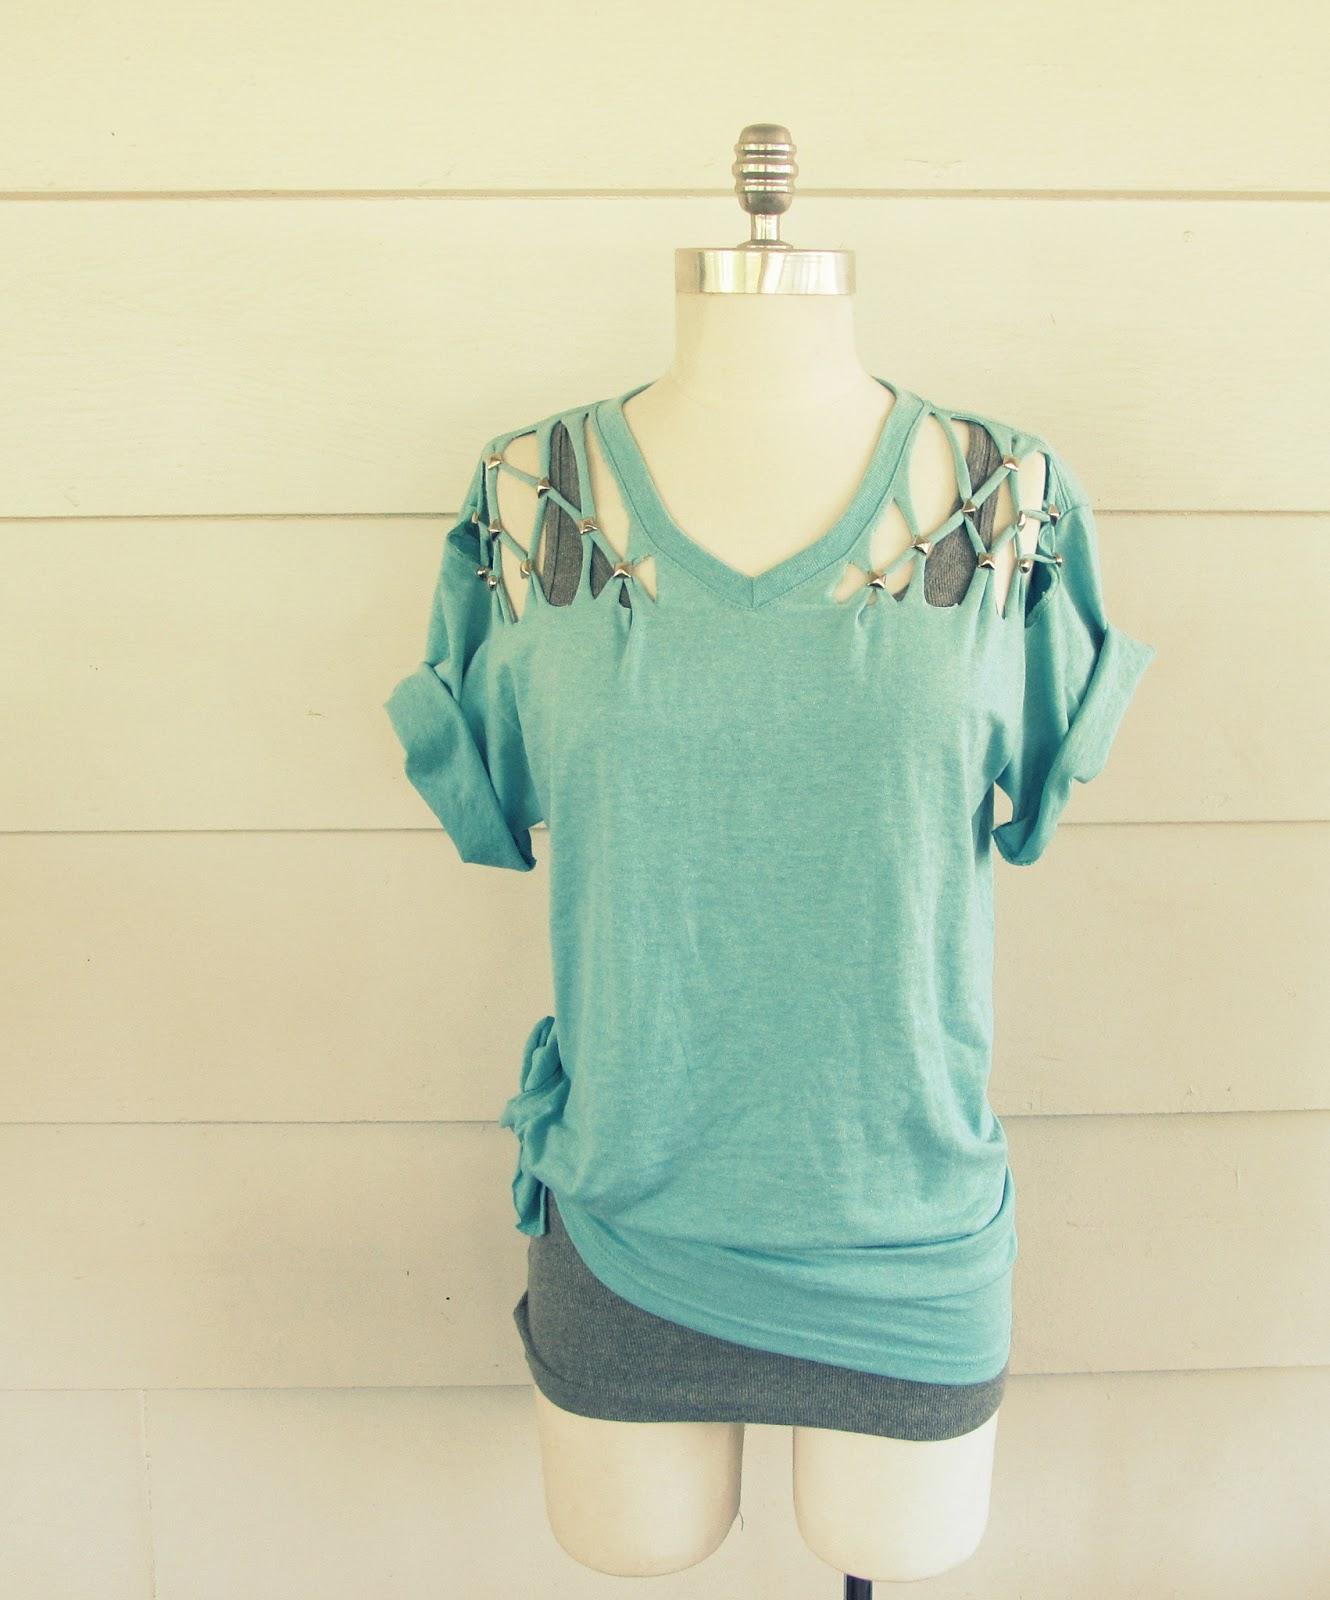 Lattice Stud T-Shirt